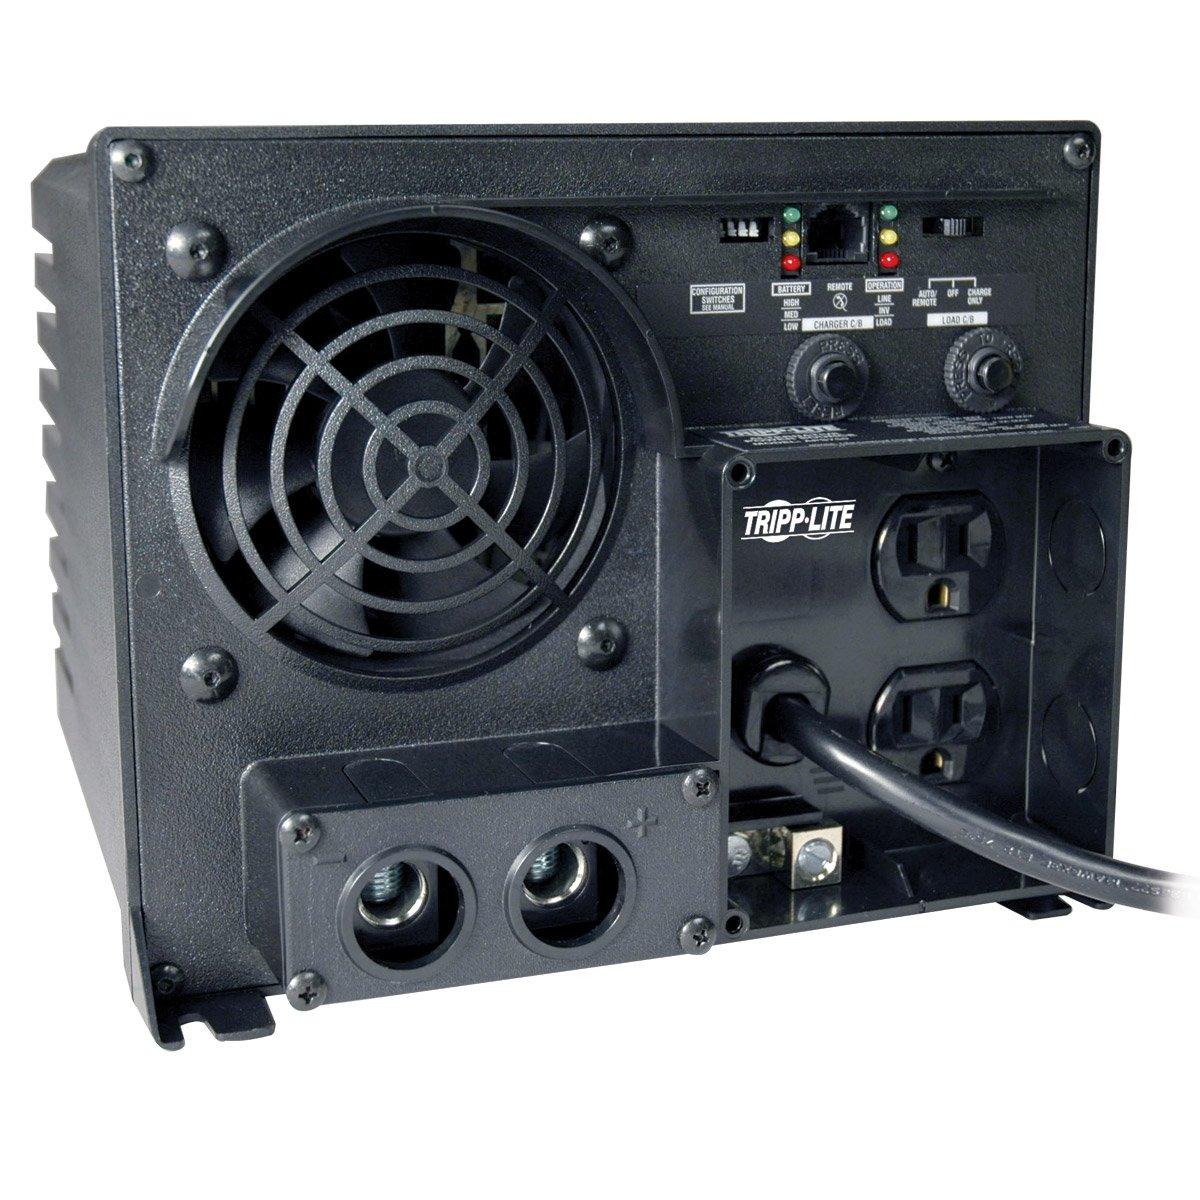 750-Watt Powerverter APS 12-Volt DC 120-Volt Inverter/Charger, 6-Foot Cord